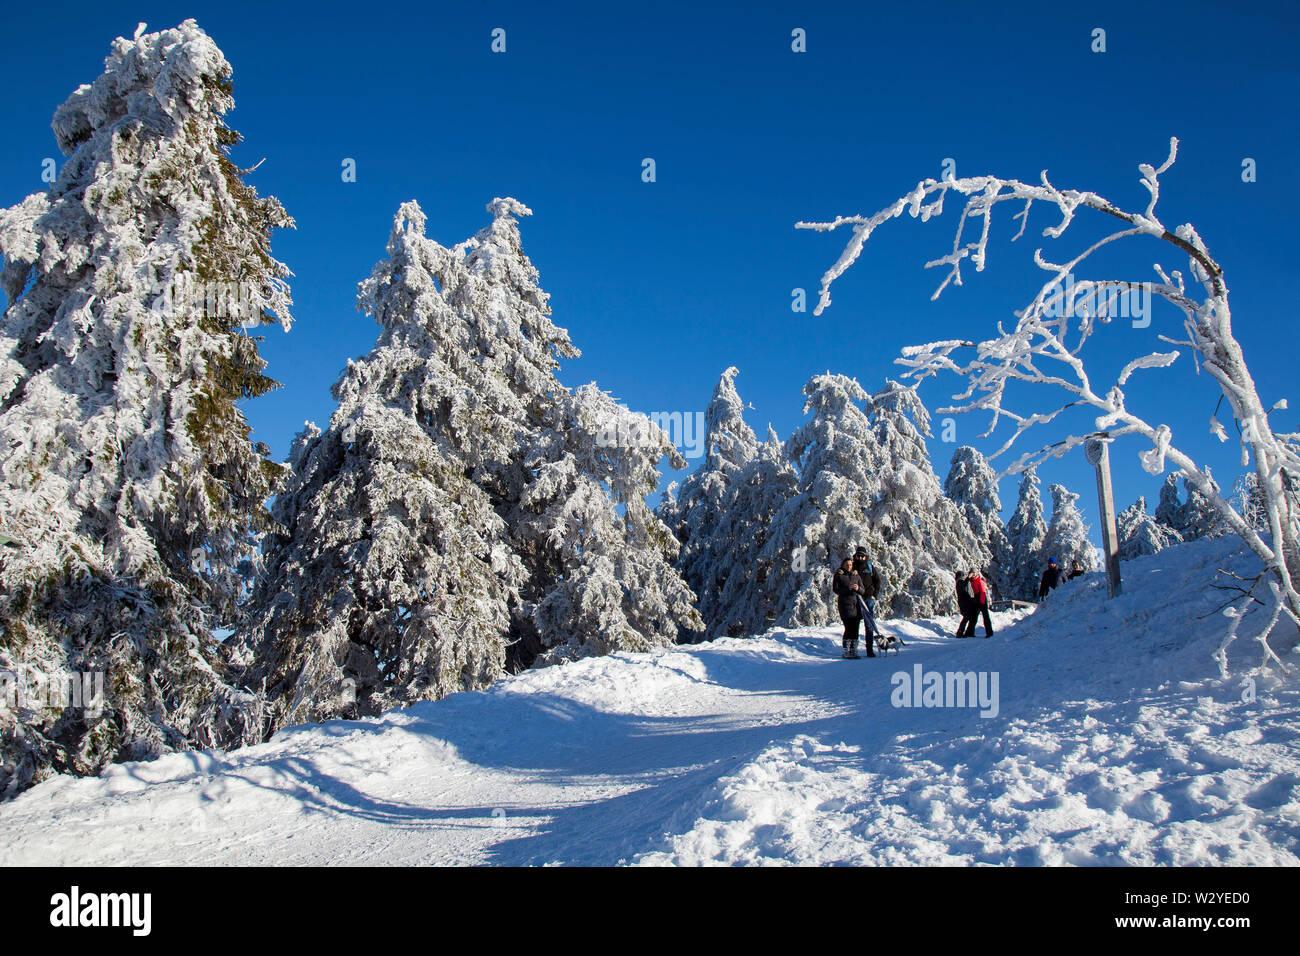 Hiker in winter landscape, summit of Wurmberg mountain, Lower Saxony, Harz National Park, Braunlage, Germany - Stock Image